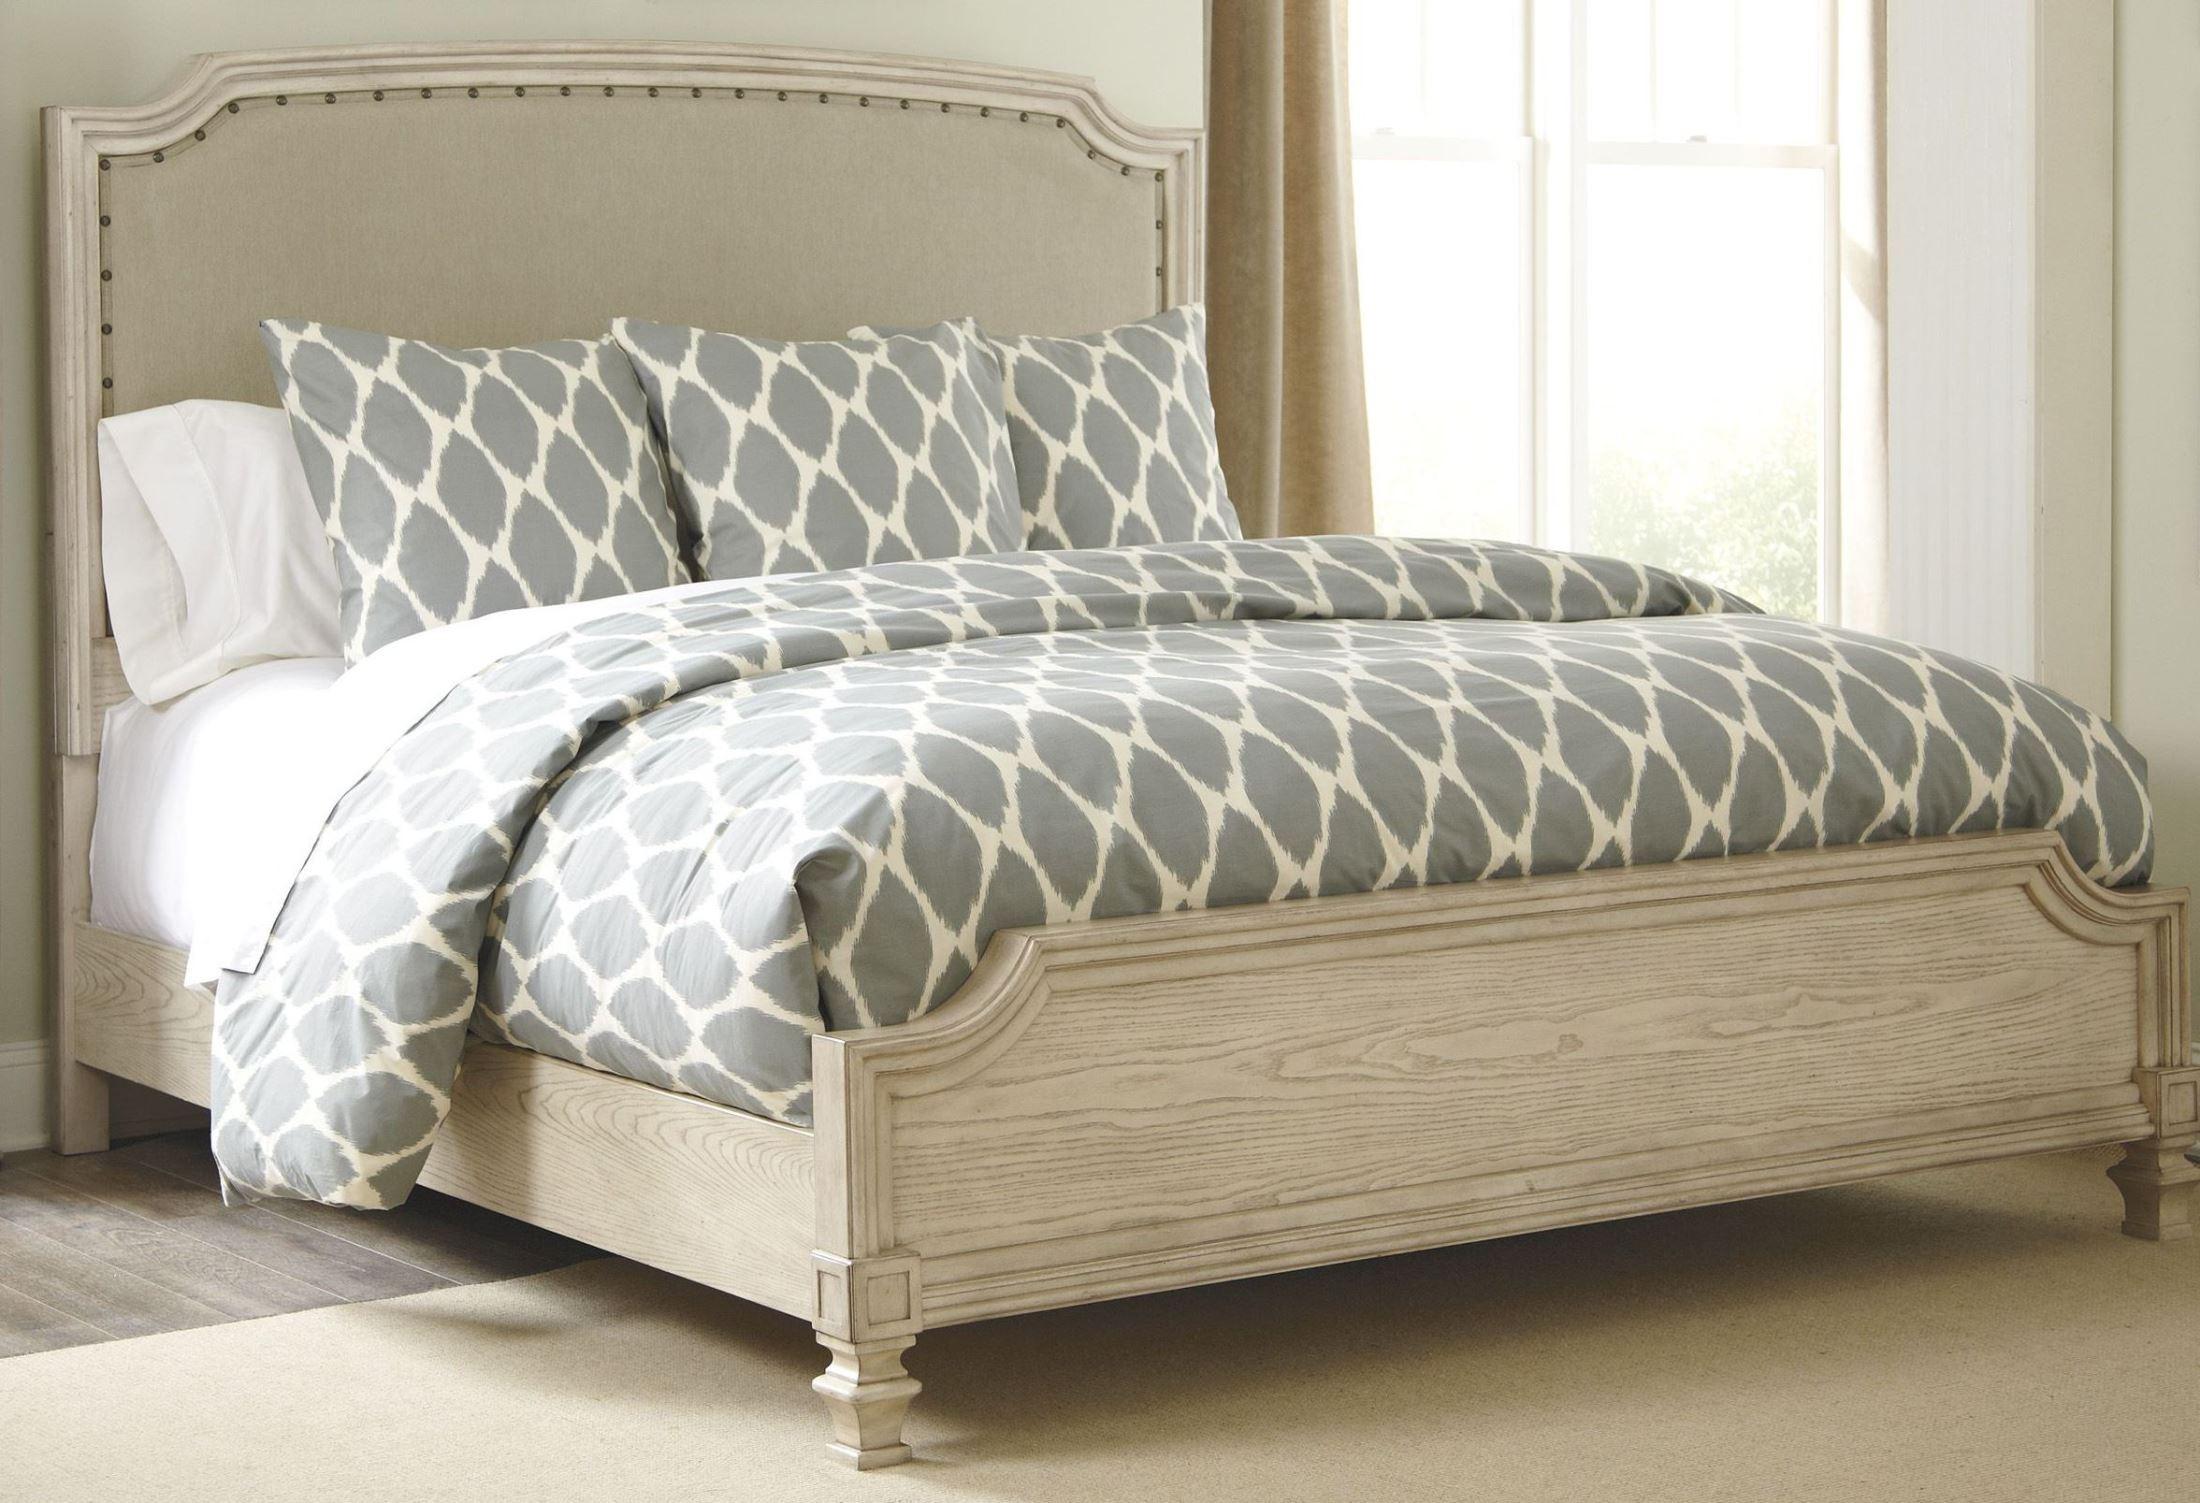 Modern Upholstered King Bed